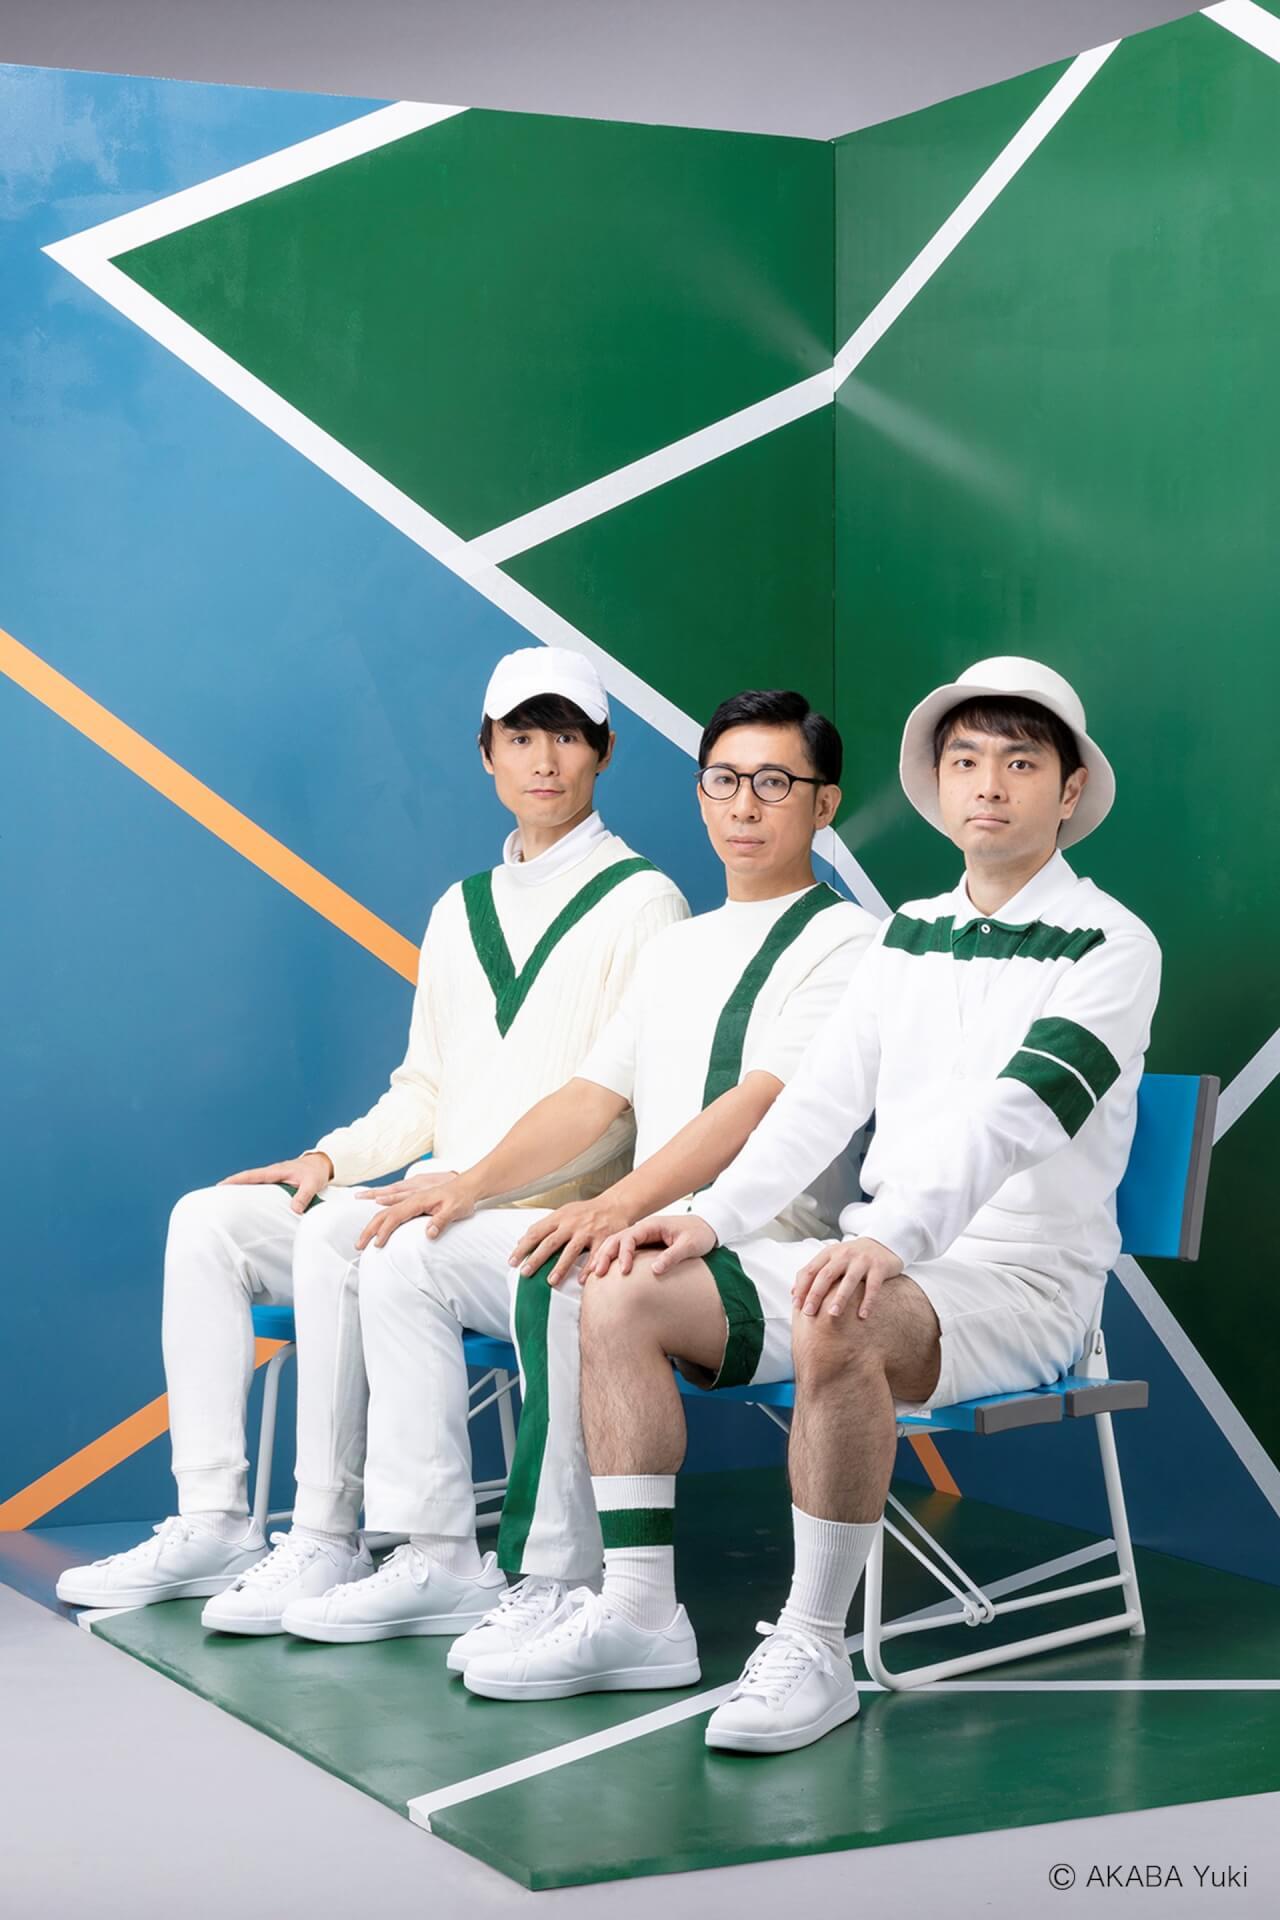 "xiangyu、山好きならではなエピソードを綴った新曲""Y△M△""をリリース <香魚荘#02>のラインナップにテニスコートら追加 music200724_xiangyu_4"